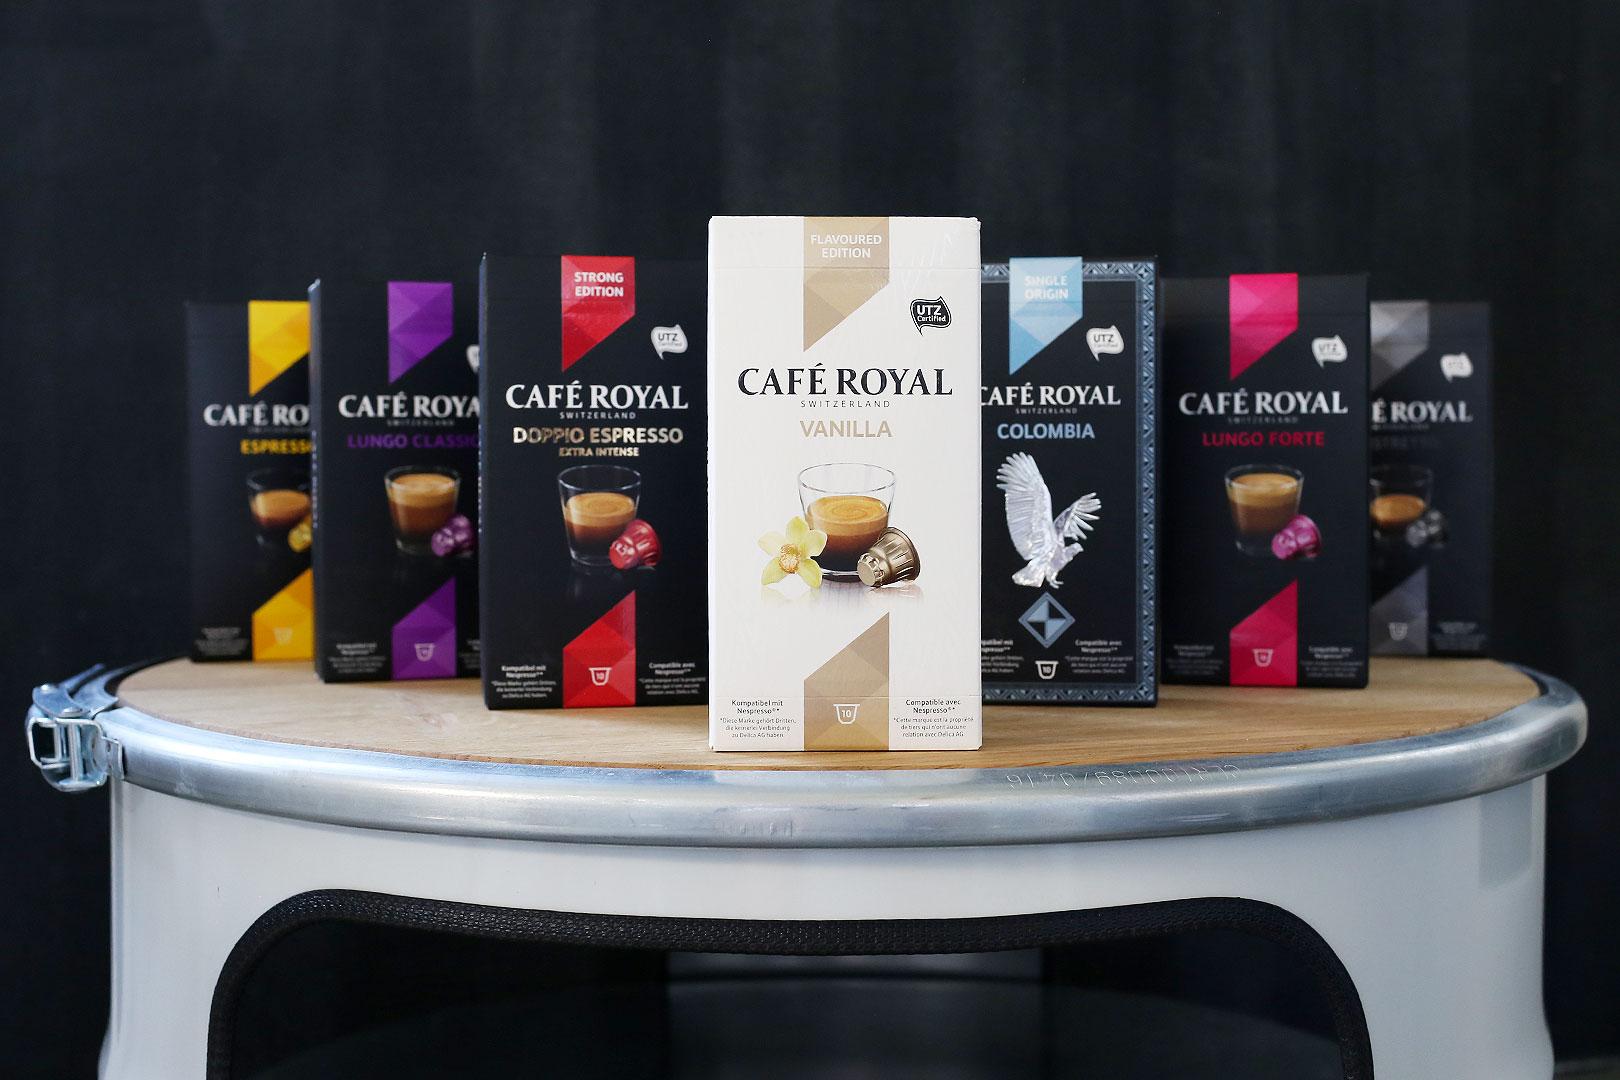 Am Wochenende abkapseln mit Café Royal